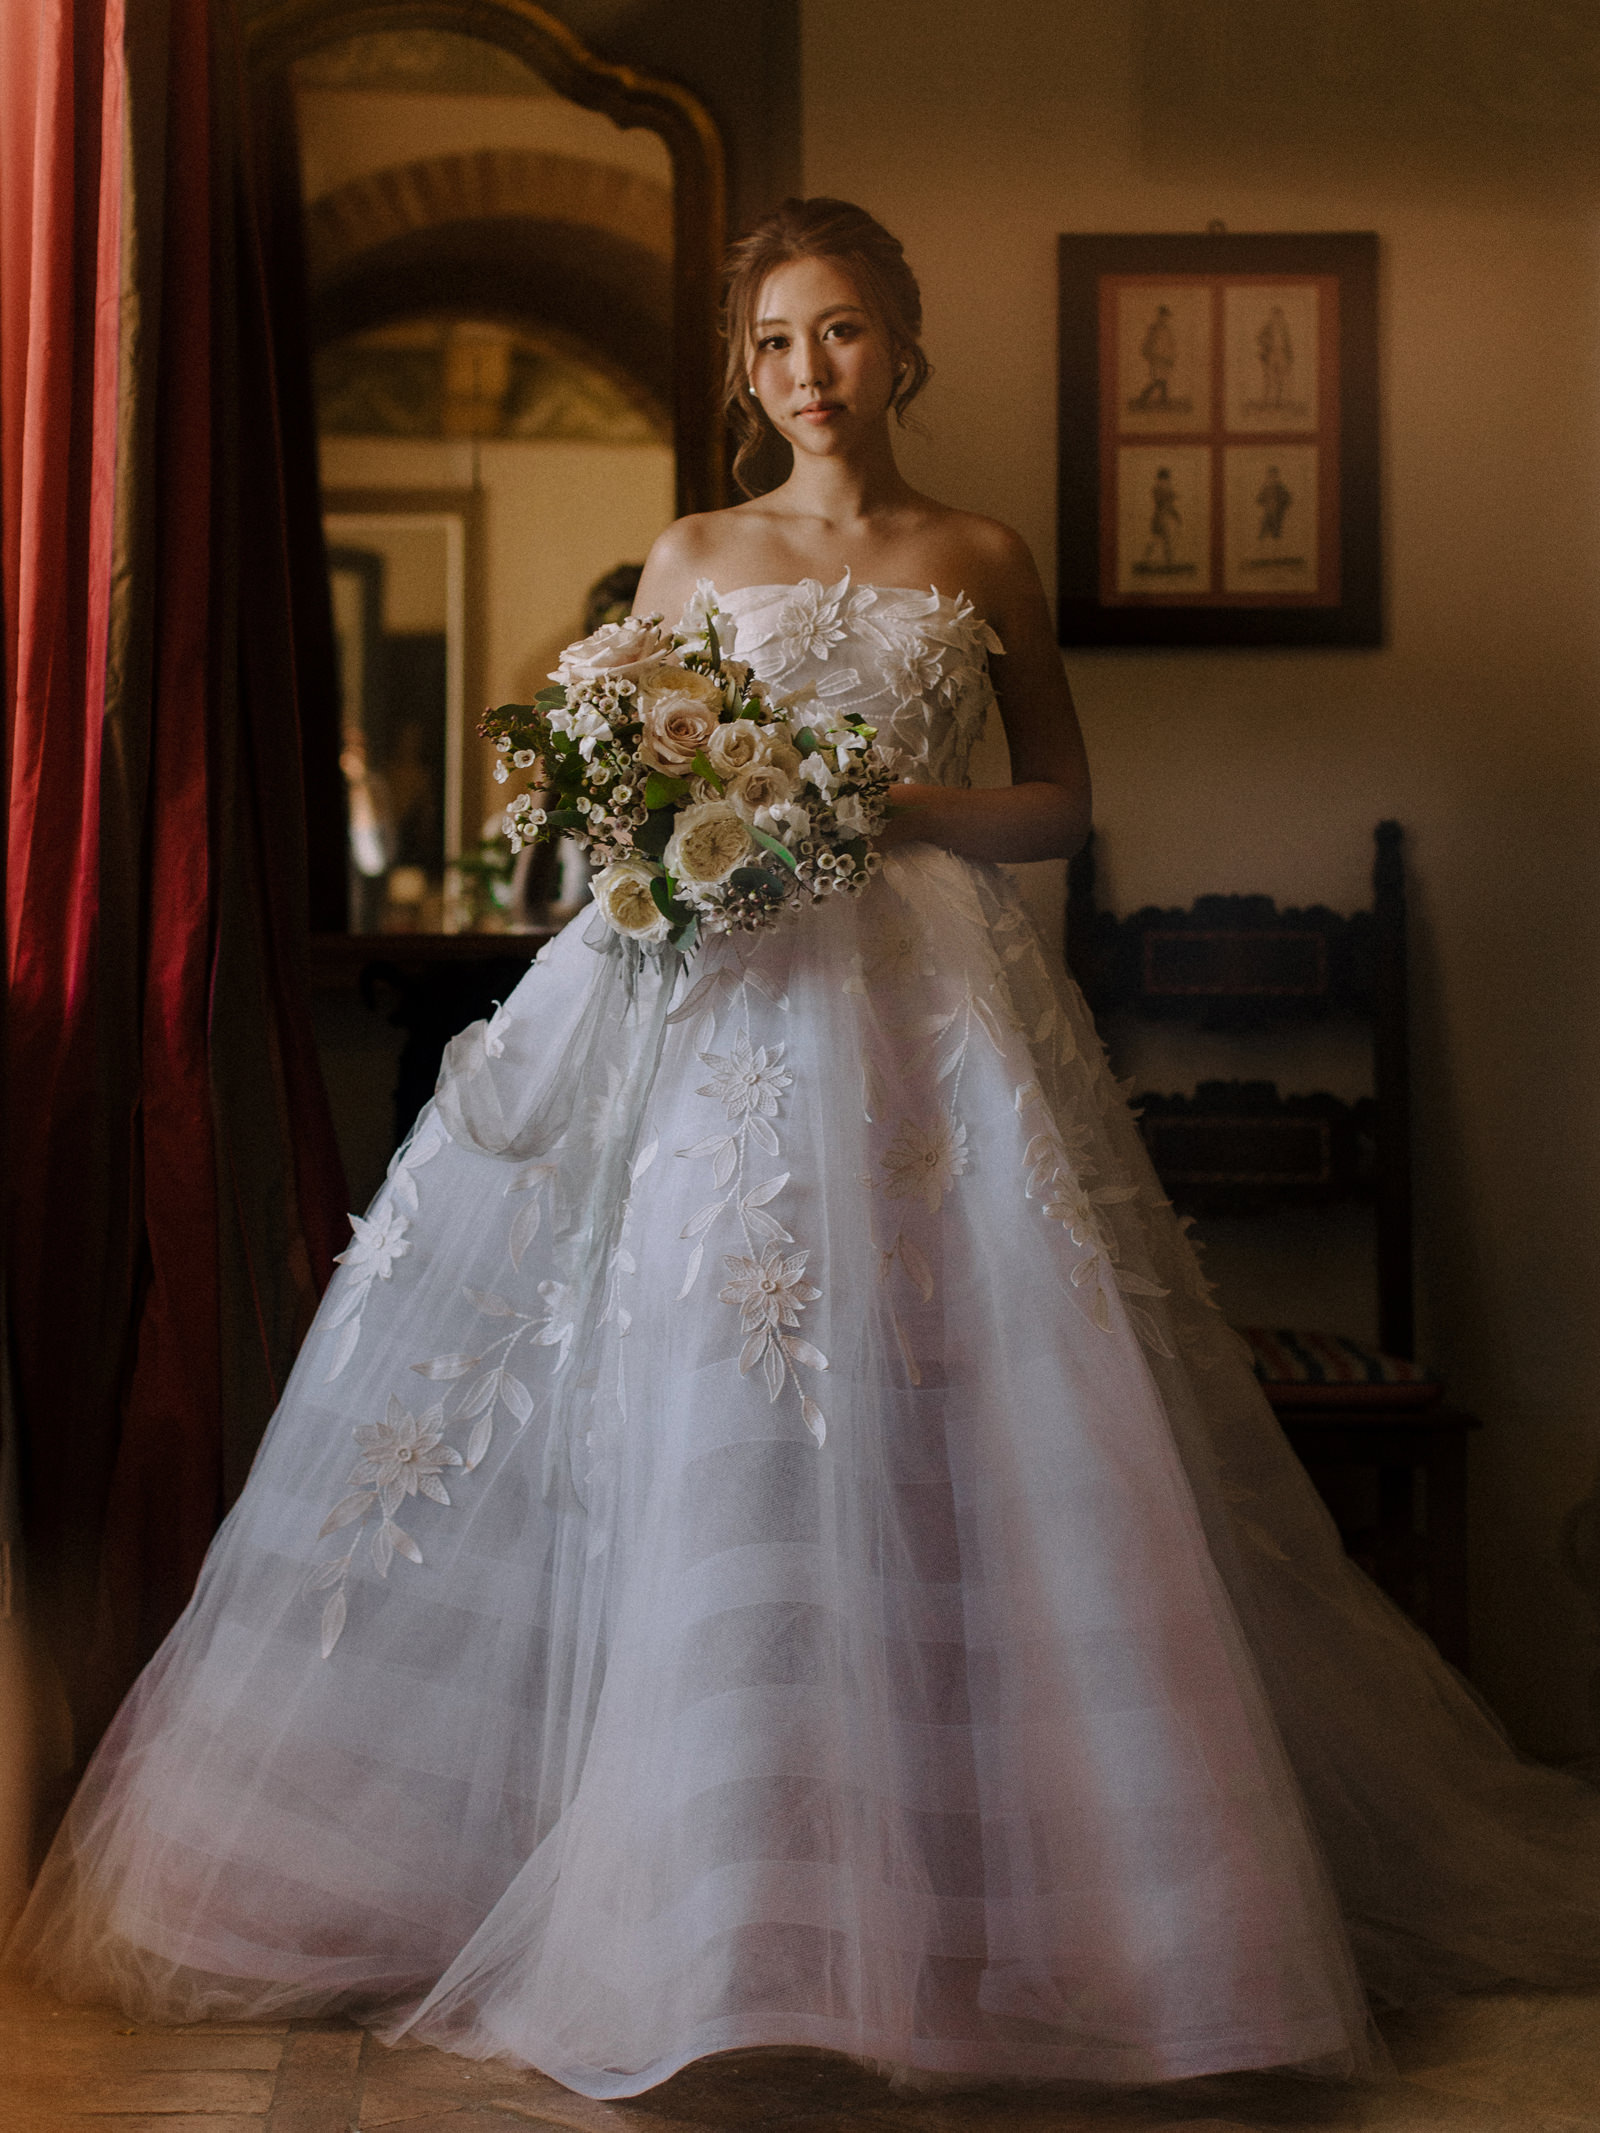 Beautiful portrait of Asian bride in full wedding gown by Nirav Patel of San Francisco